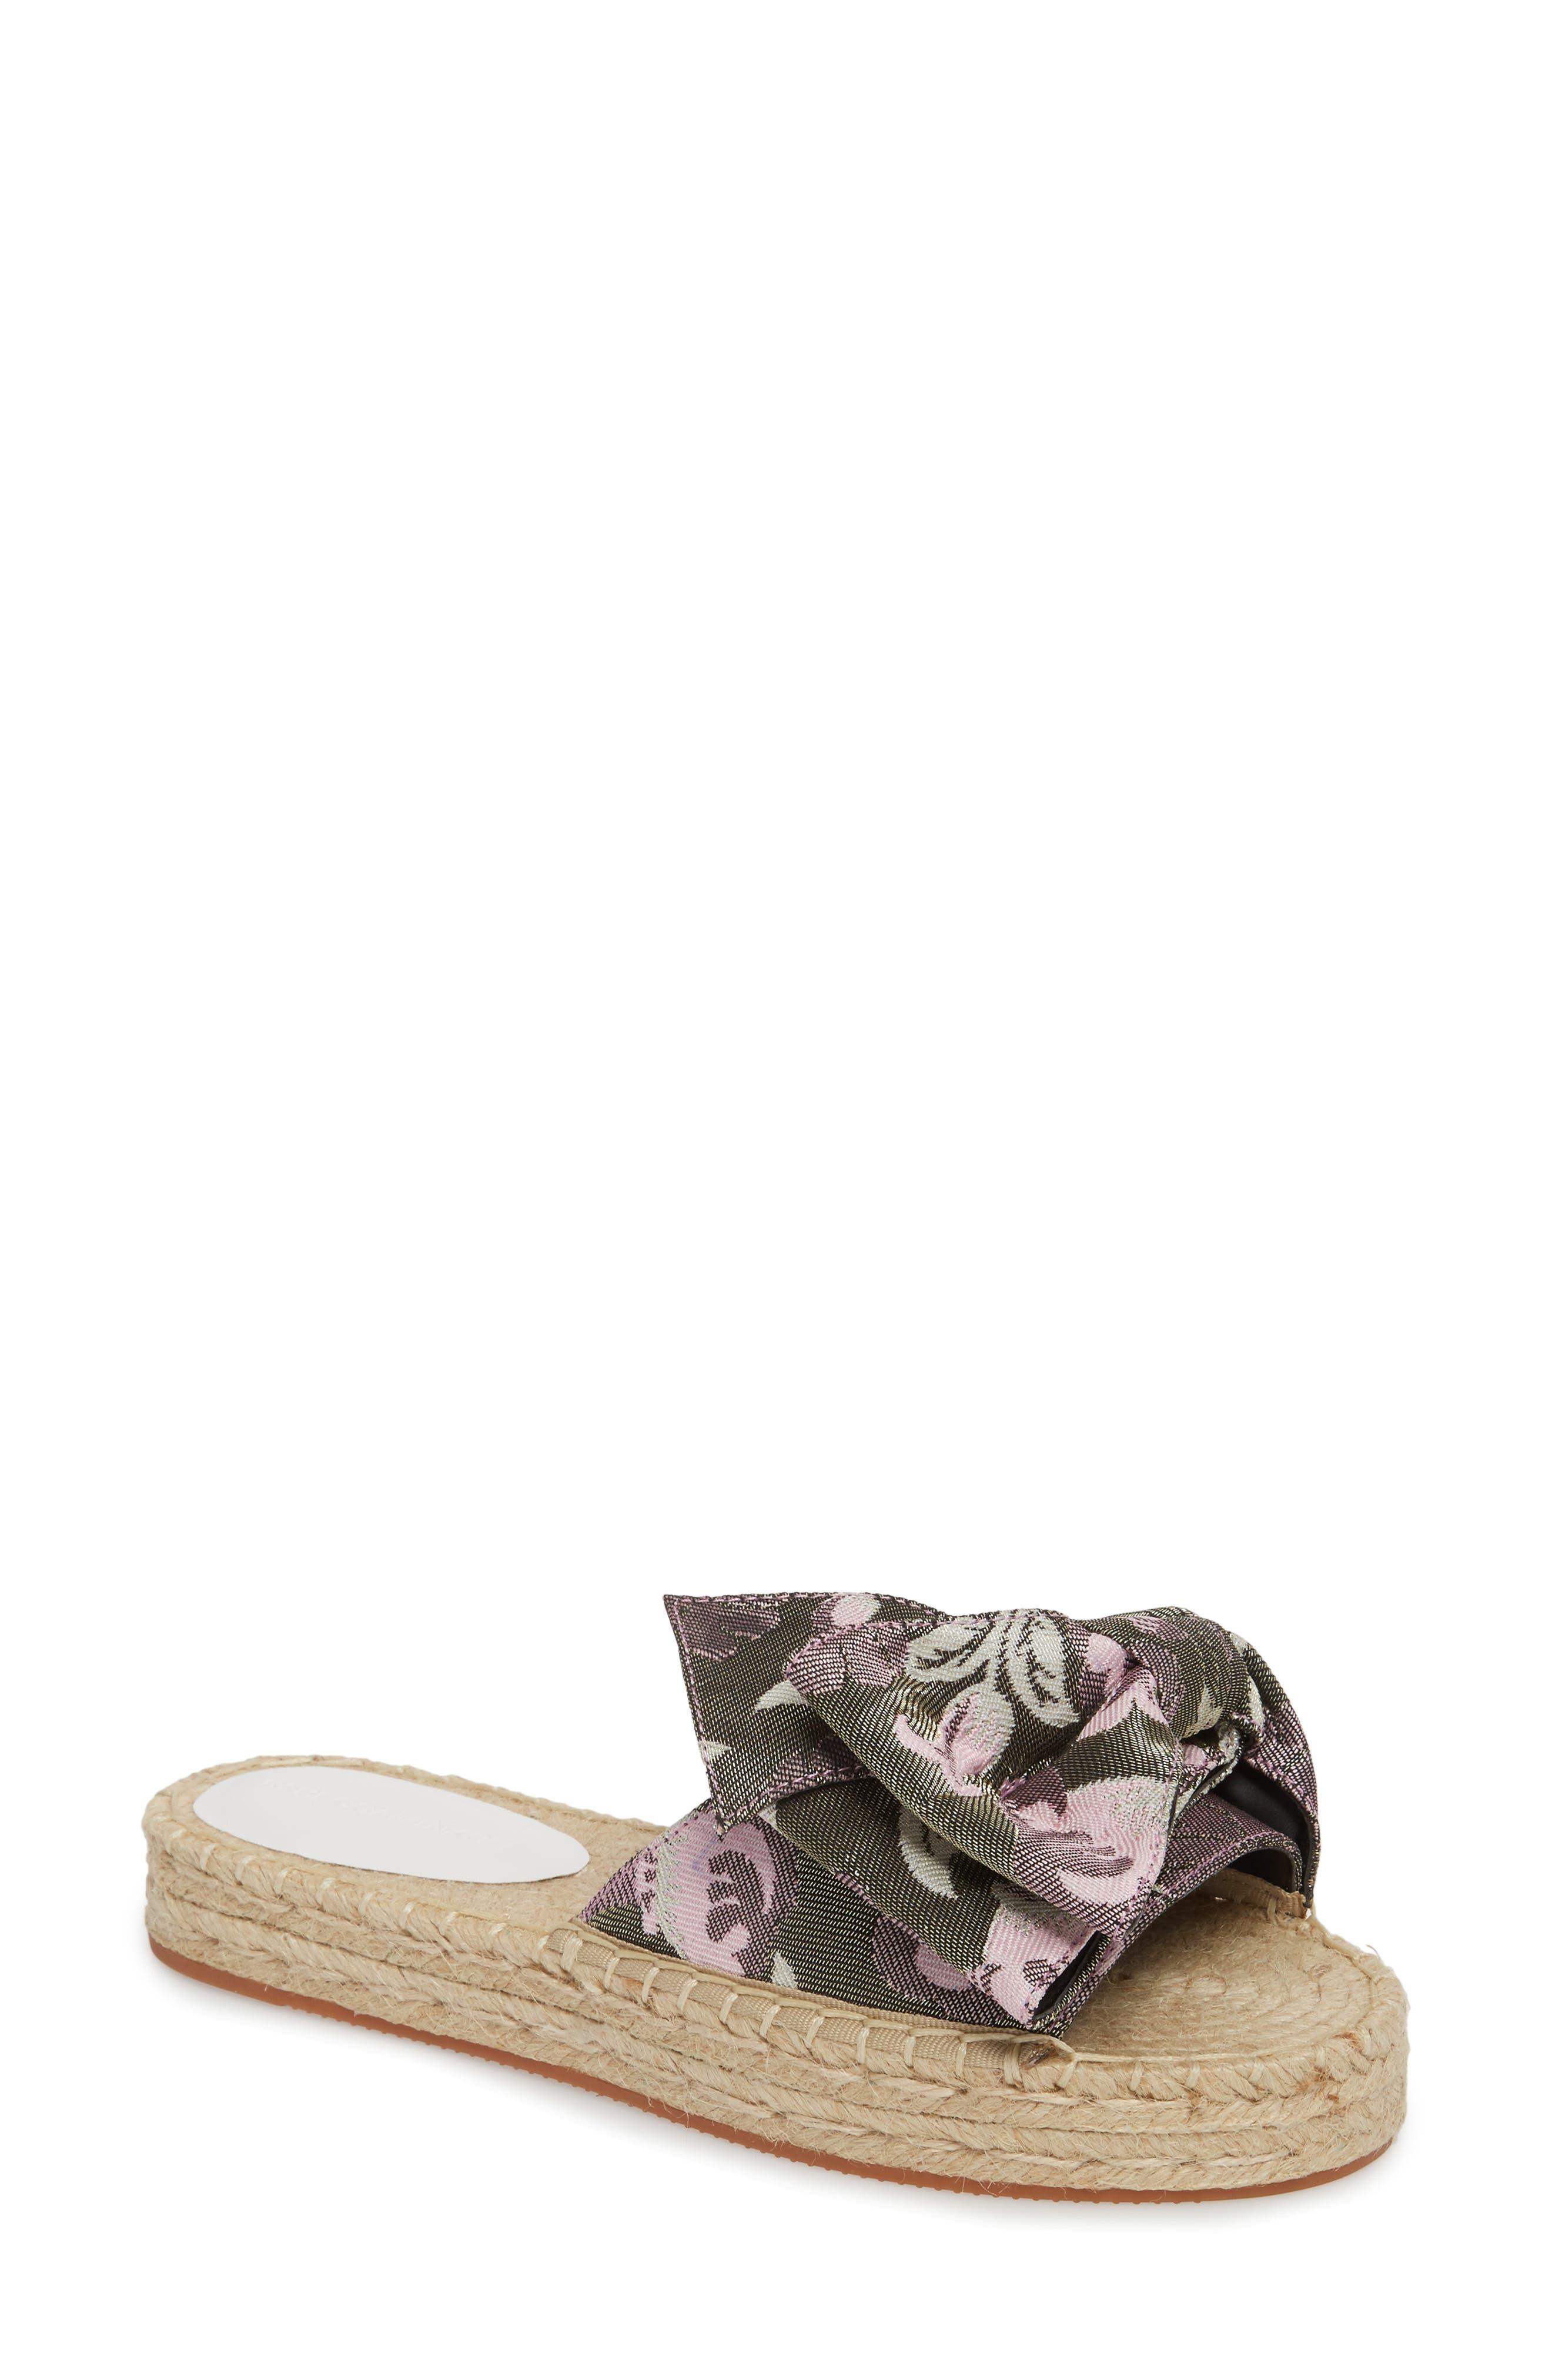 Giana Bow Slide Sandal,                         Main,                         color, GREEN MULTI JACQUARD